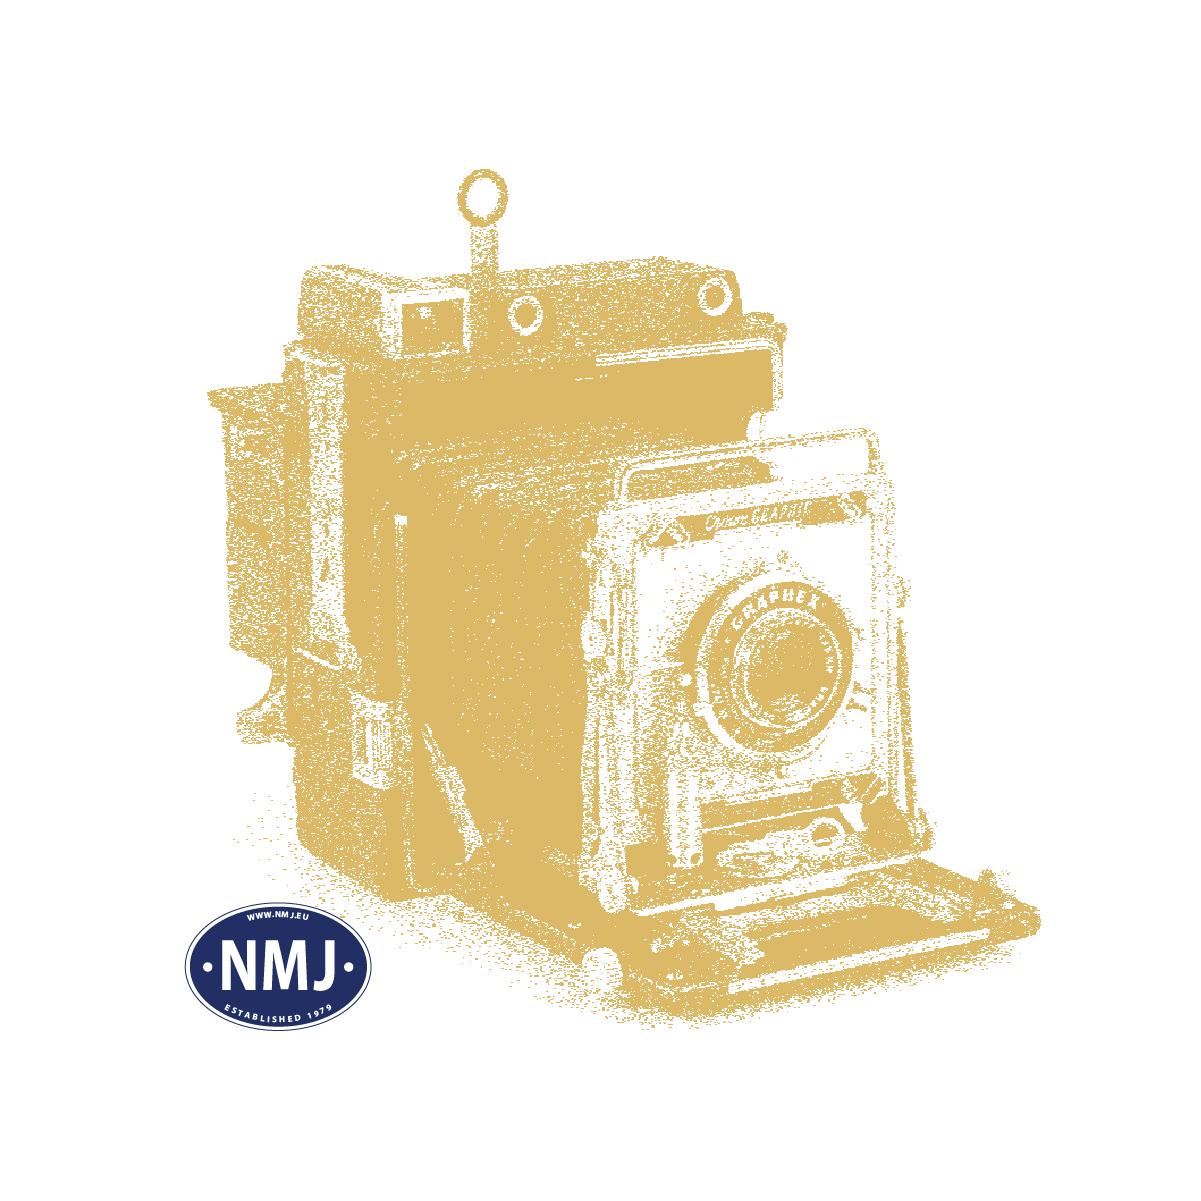 NMJT505.303 - NMJ Topline NSB Rps 31 76 393 3 202-3 w/ Finsam Wood Chip Boxes